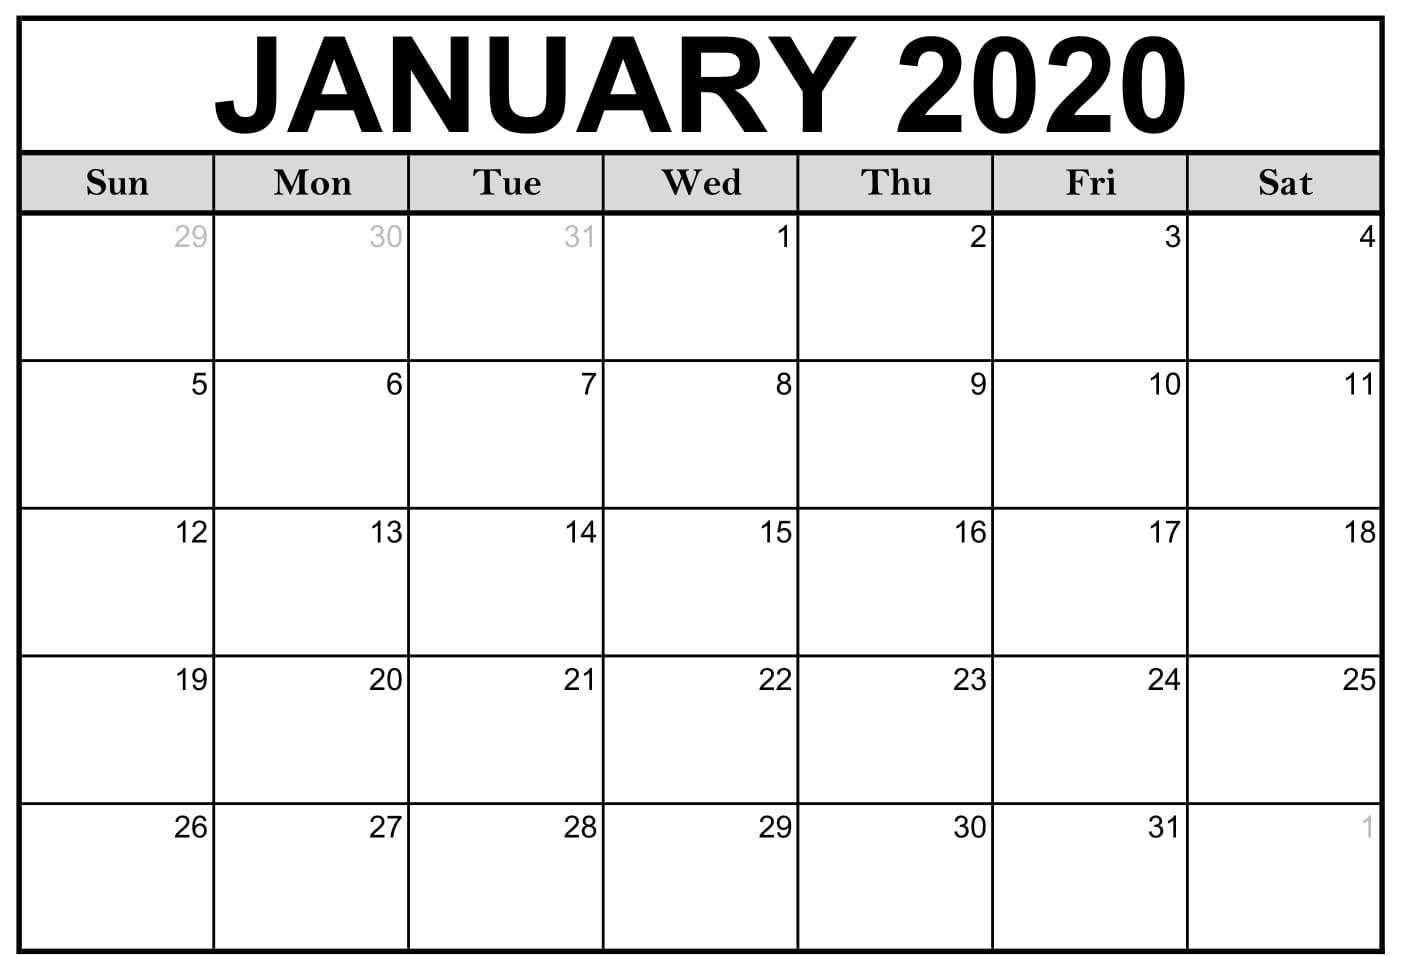 Monthly Calendar 2021 Printable Large | Calendar Template Printable in Free Printable 2021 Calendar Templates Word